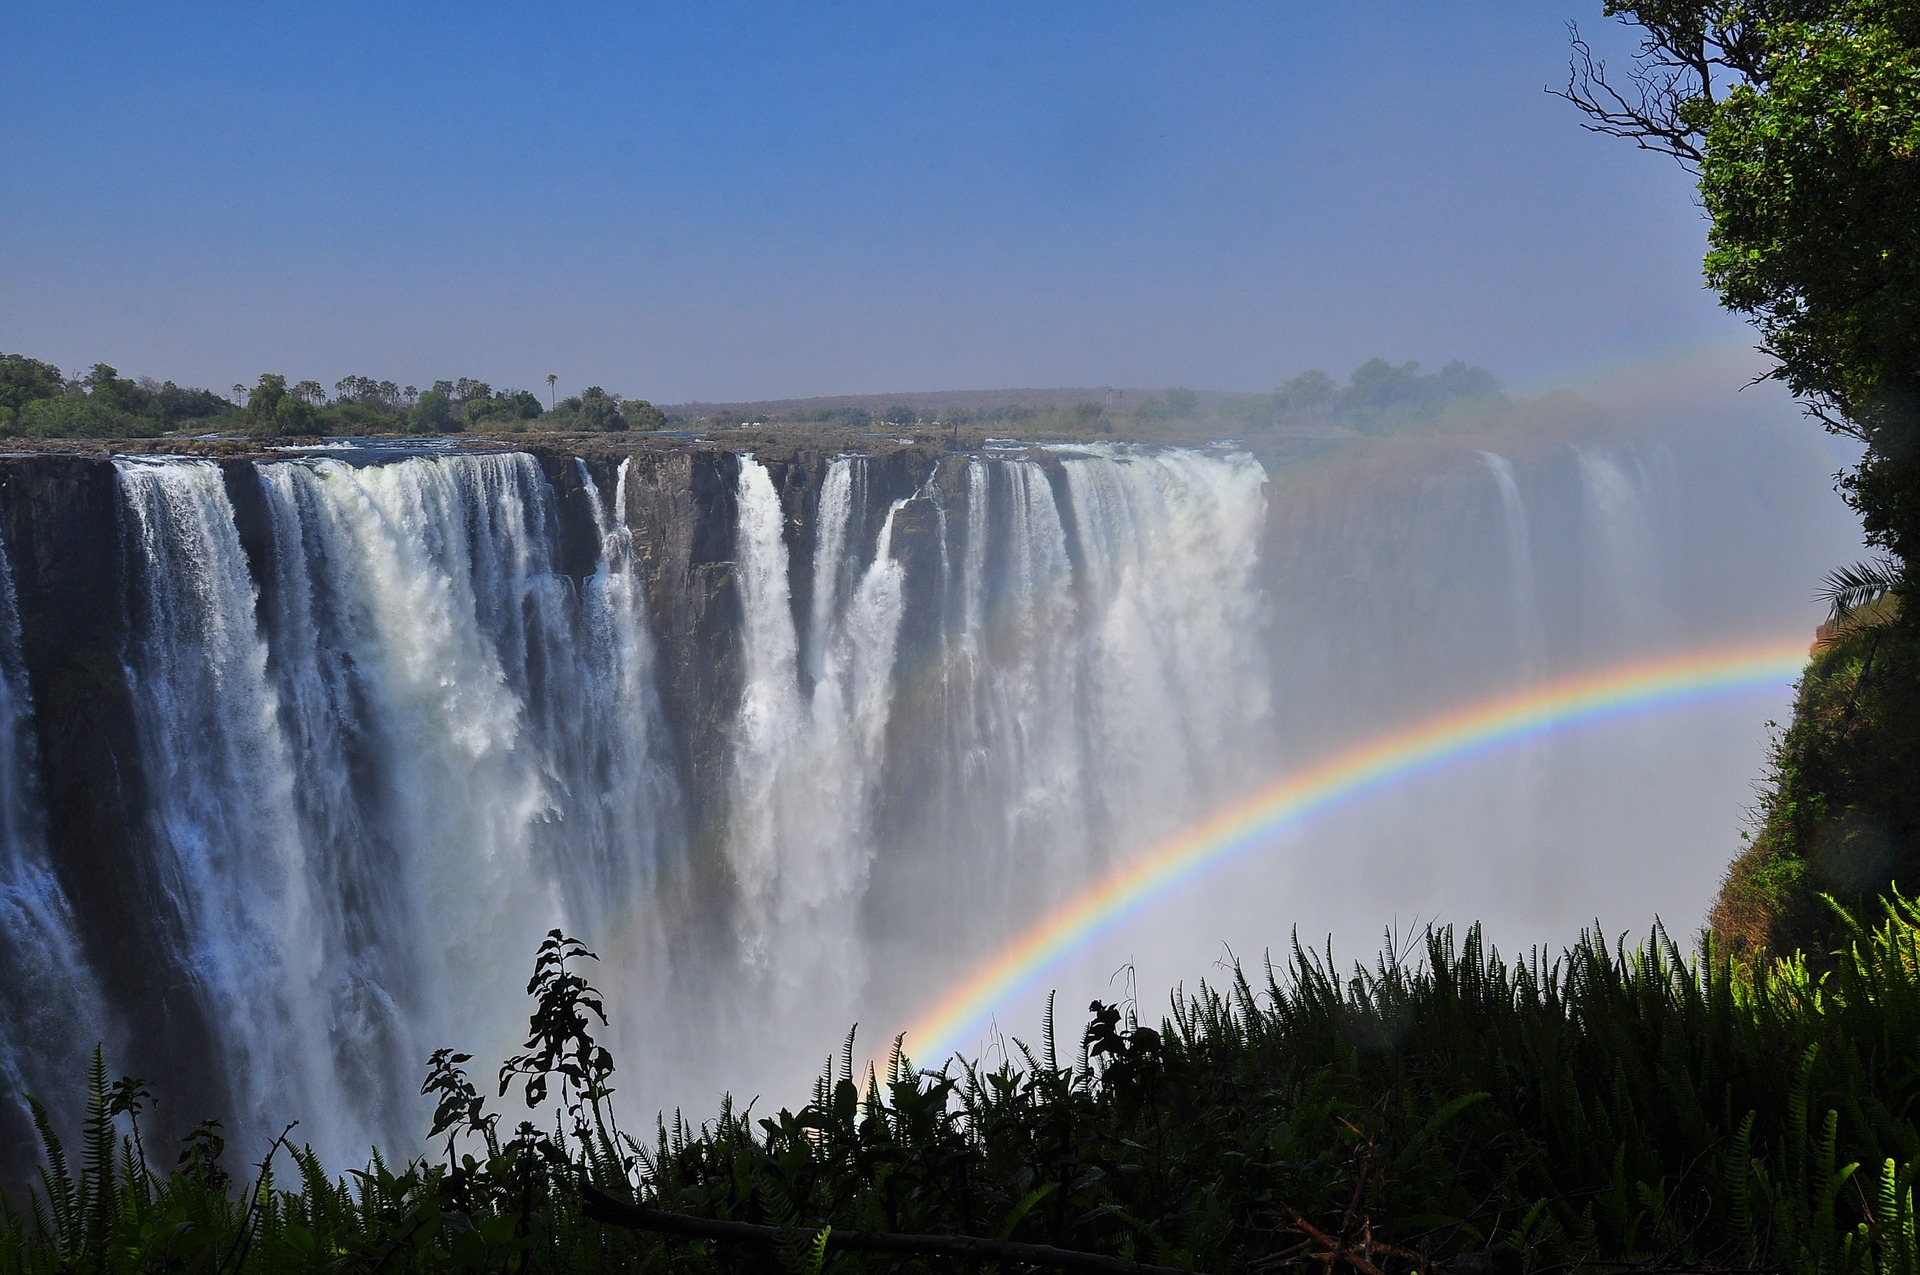 rainbow-3320571_1920-1